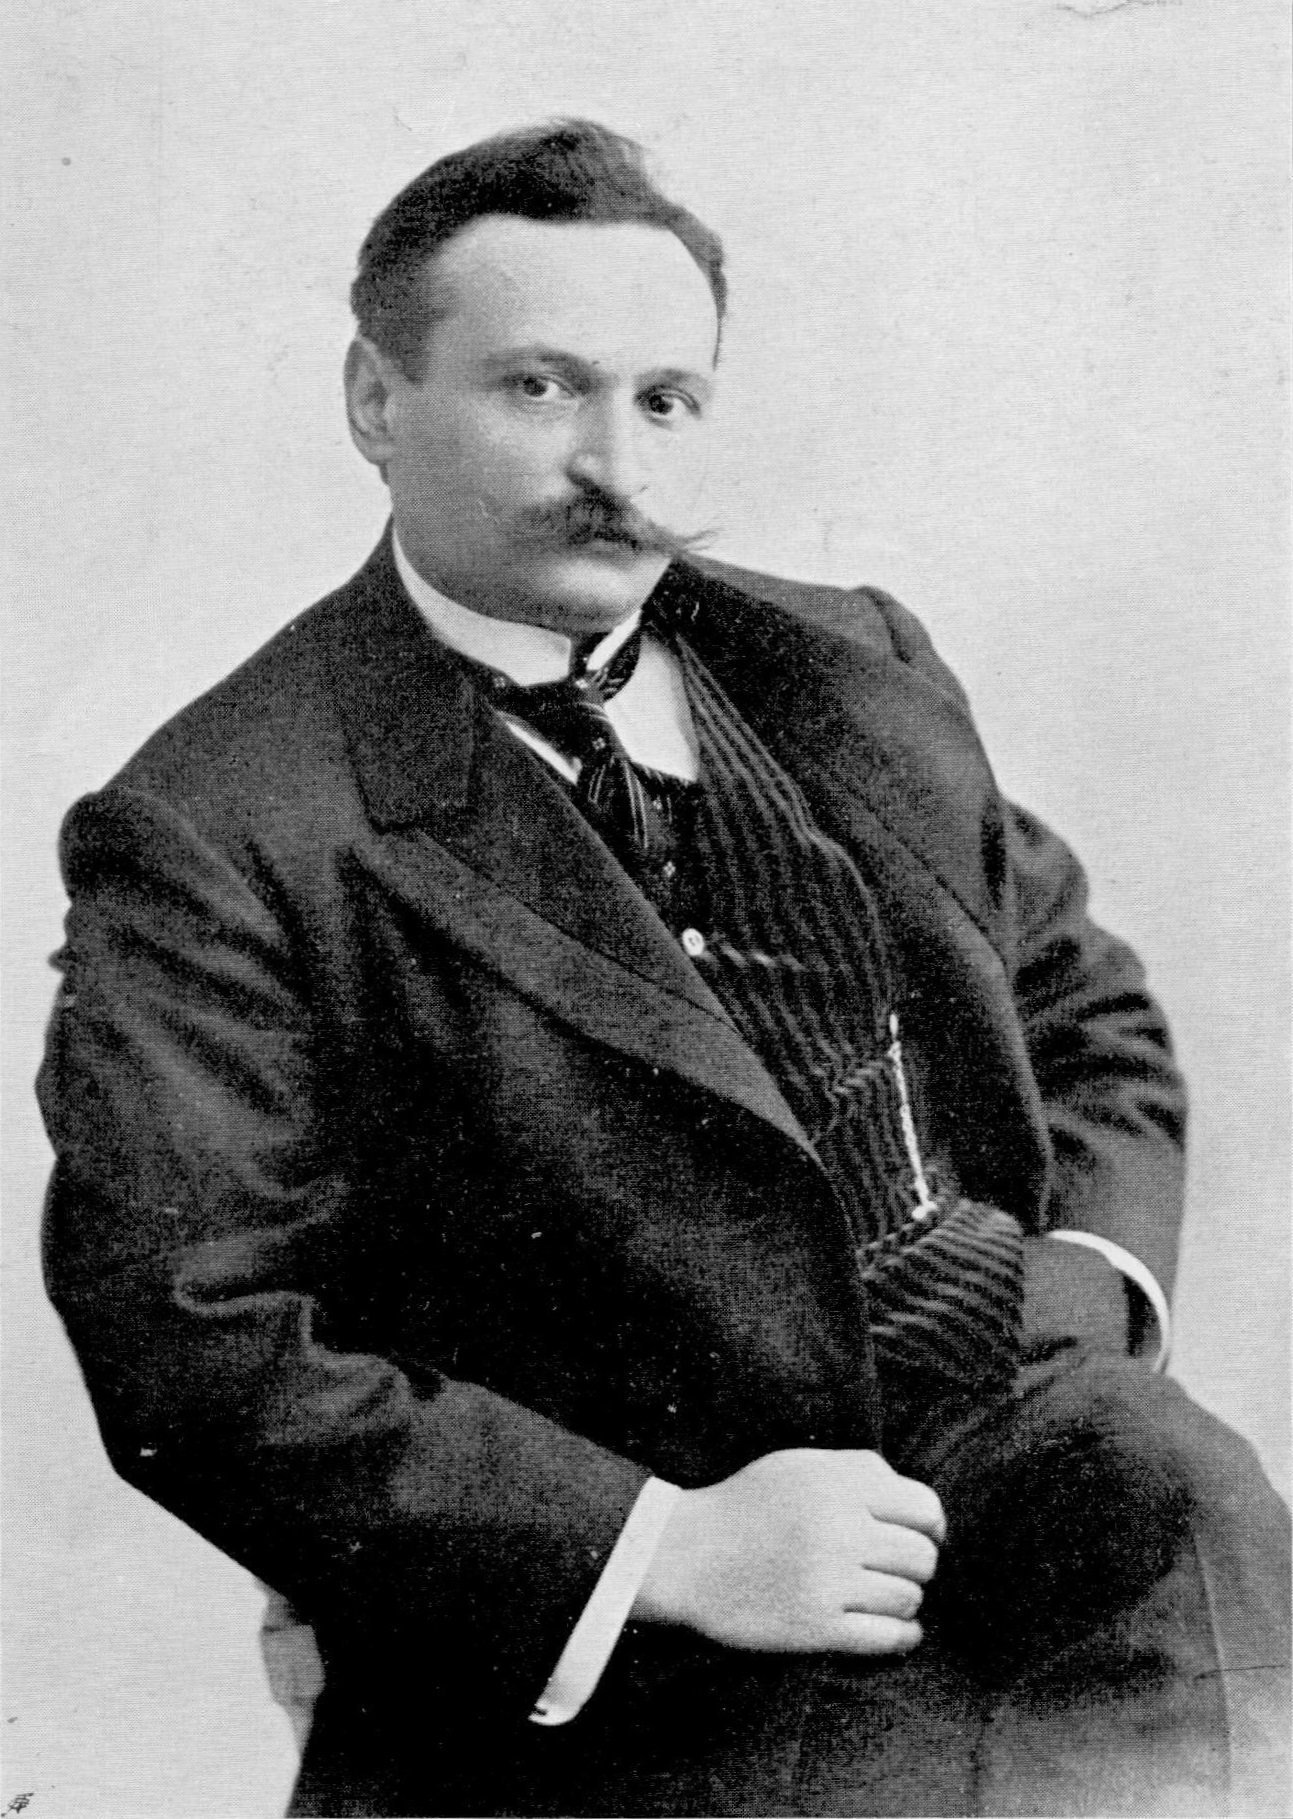 Tevfik Fikret was Nurullah Ataç's favorite poet.